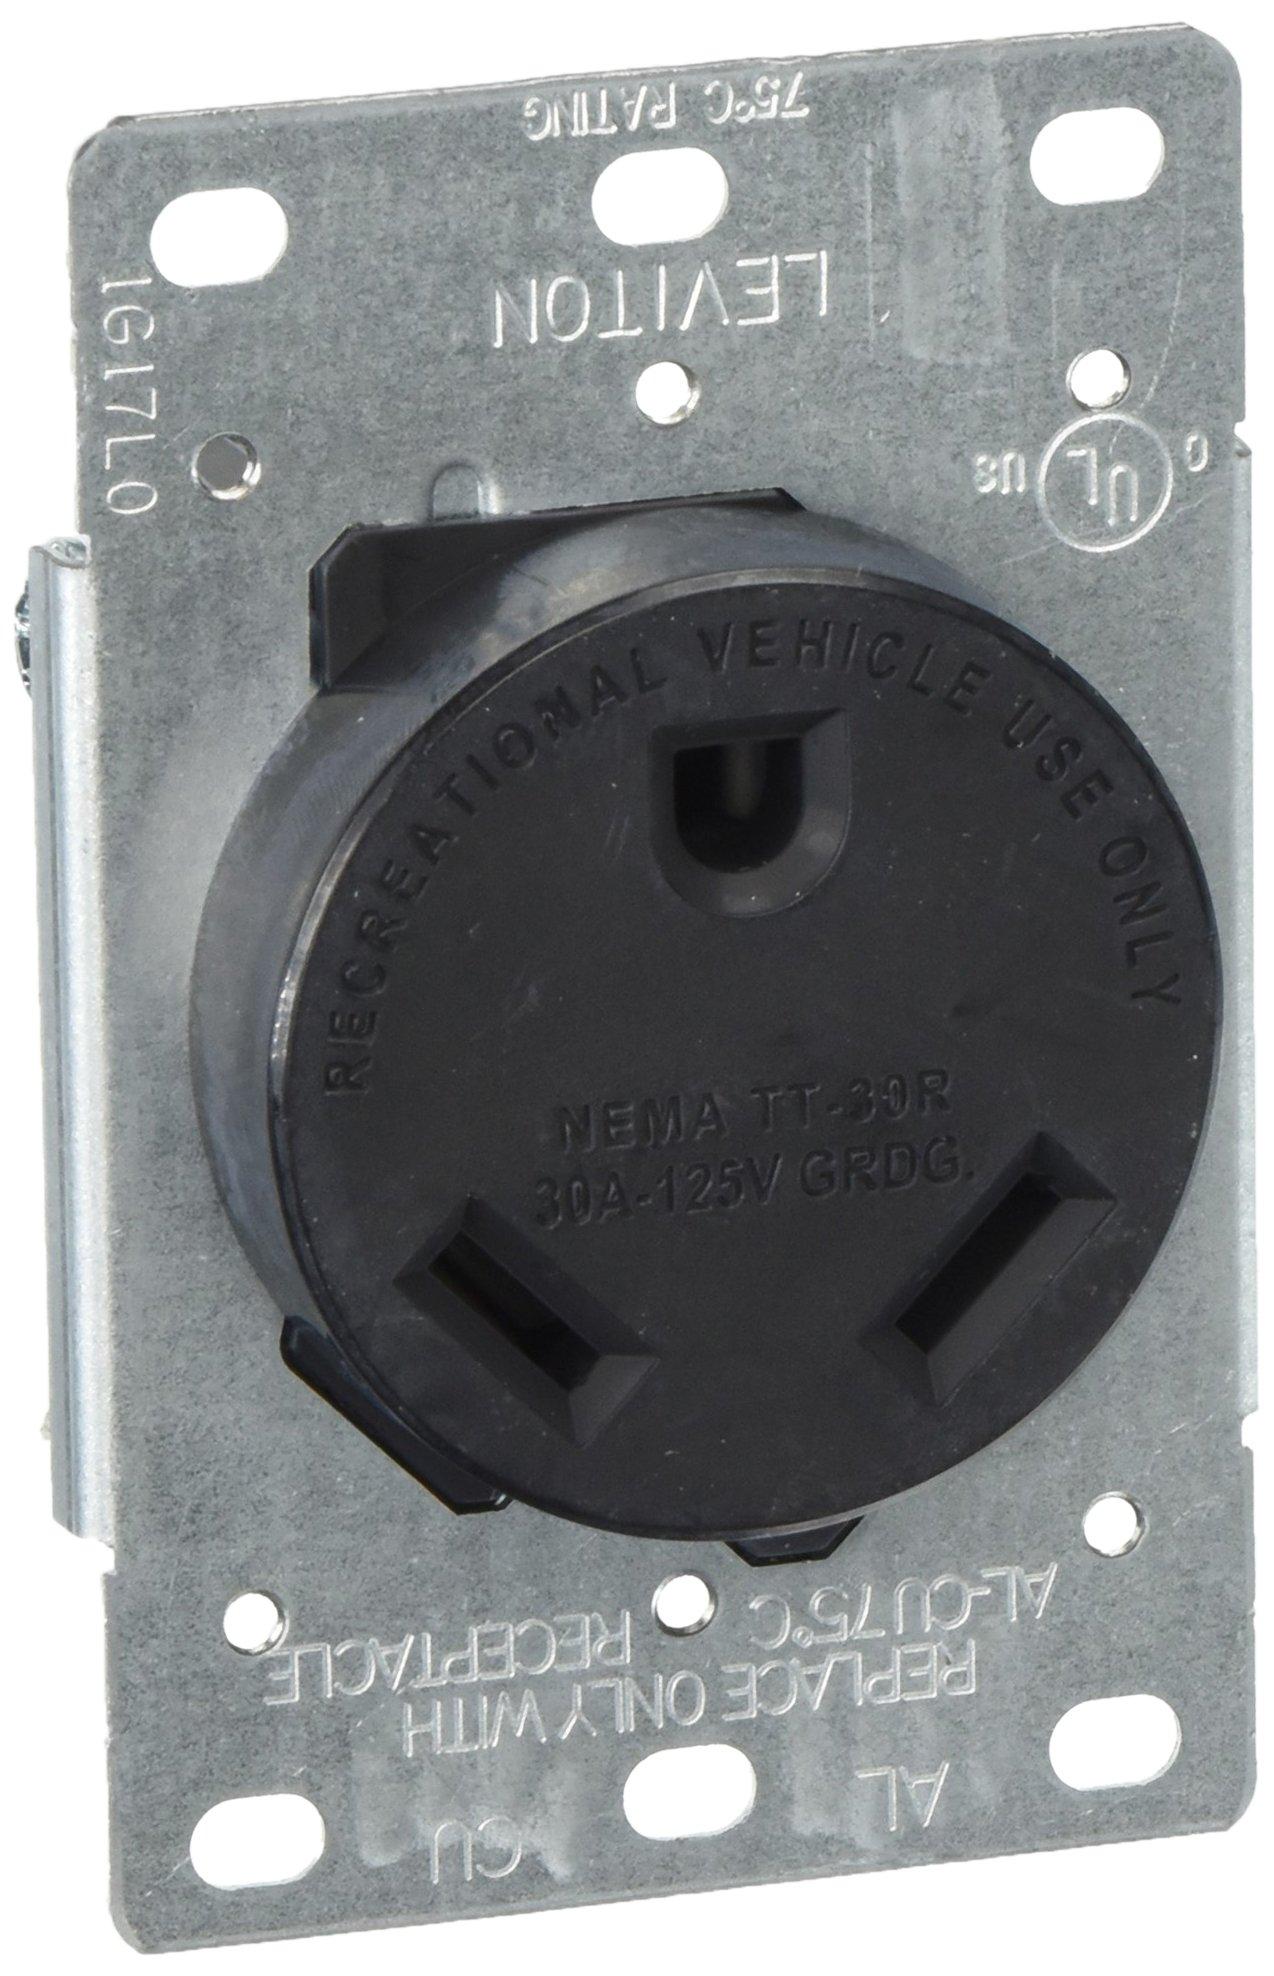 Leviton 7313-S00 30 Amp, 125 Volt, Nema TT-30R, 2P, 3W, Flush Mtg Receptacle, Straight Blade, Industrial Grade, Grounding Side Wired, Steel Strap-Black